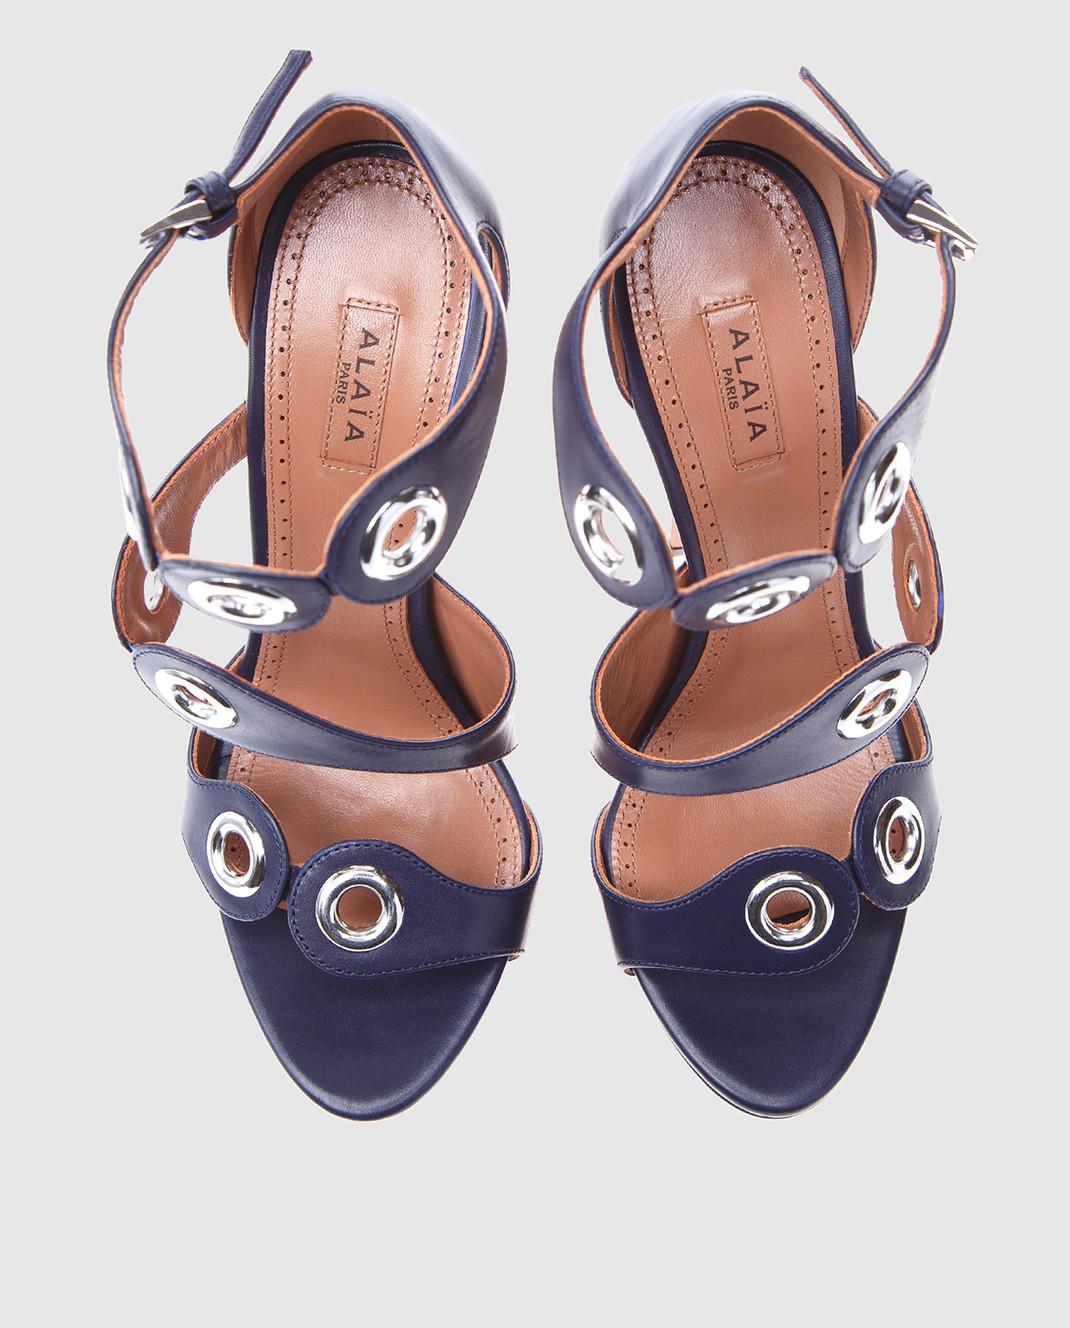 Azzedine Alaia Синие кожаные босоножки 7E3X404CG68 изображение 4